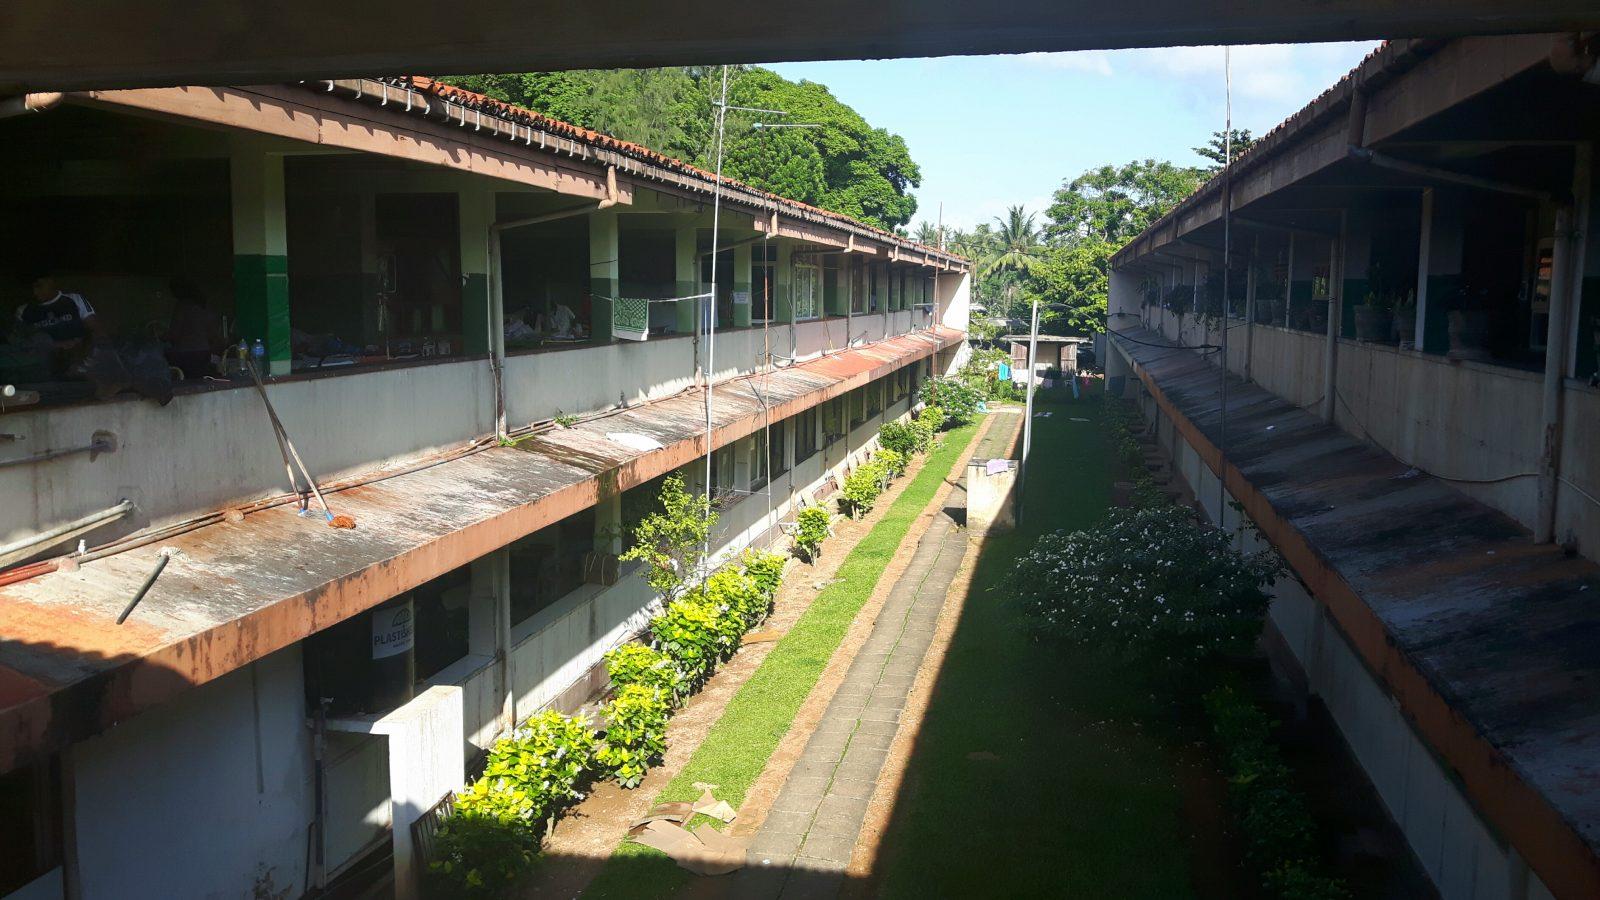 PJ in Sri Lanka (Galle) - Ablauf in der Chirurgie - Karapitya Hospital